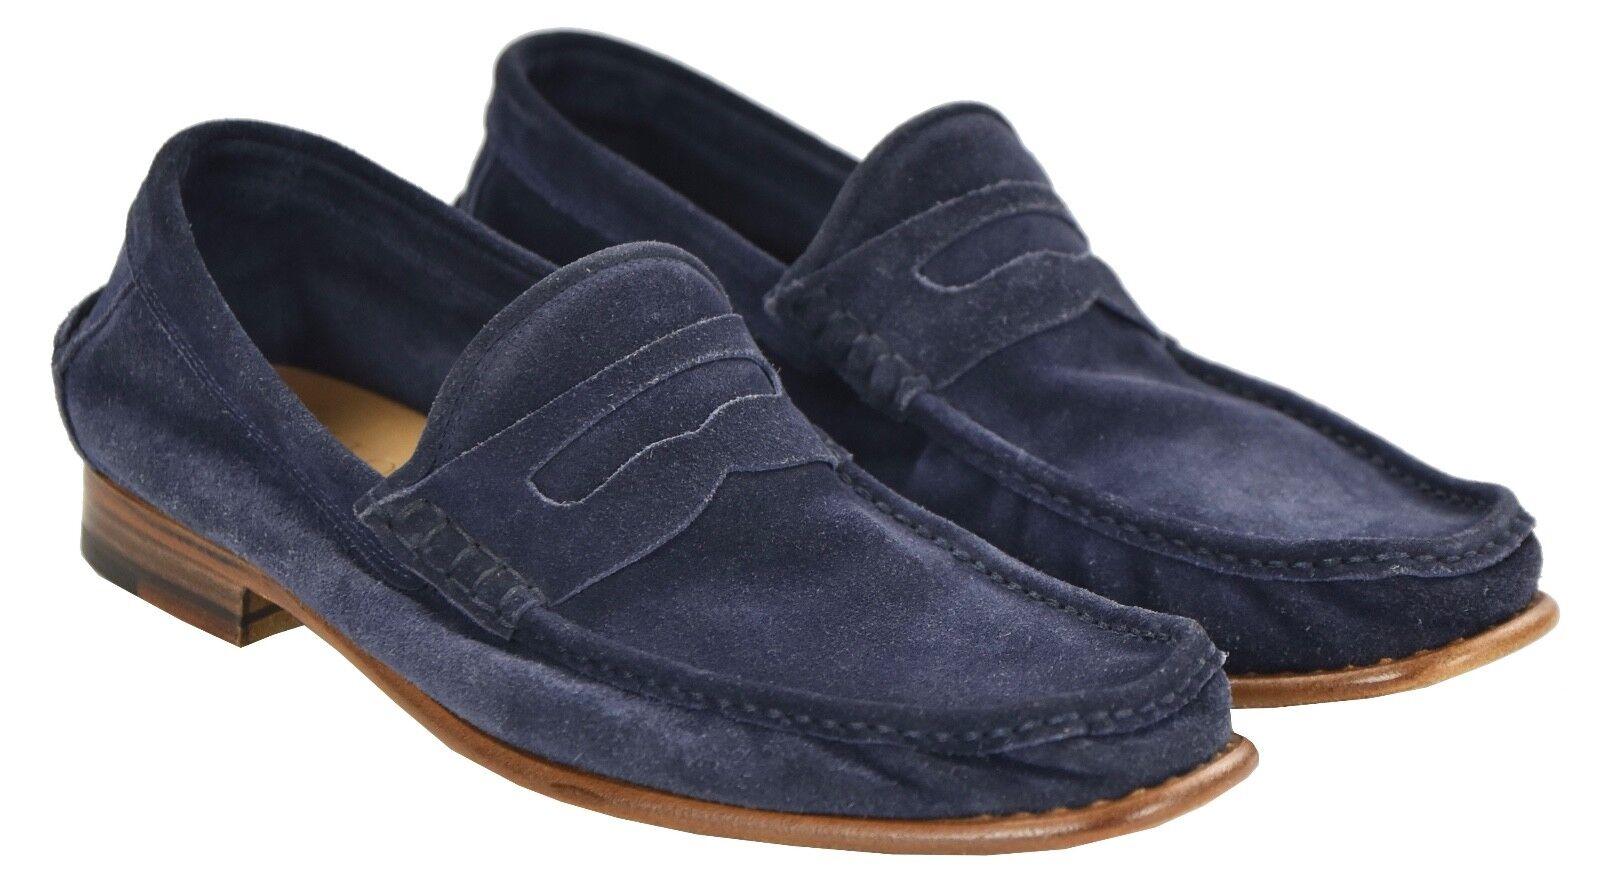 NEW KITON NAPOLI LOAFERS LOAFERS LOAFERS scarpe 100% LEATHER SUEDE Dimensione 7.5 US 40.5 EU 19O38 fcbce5